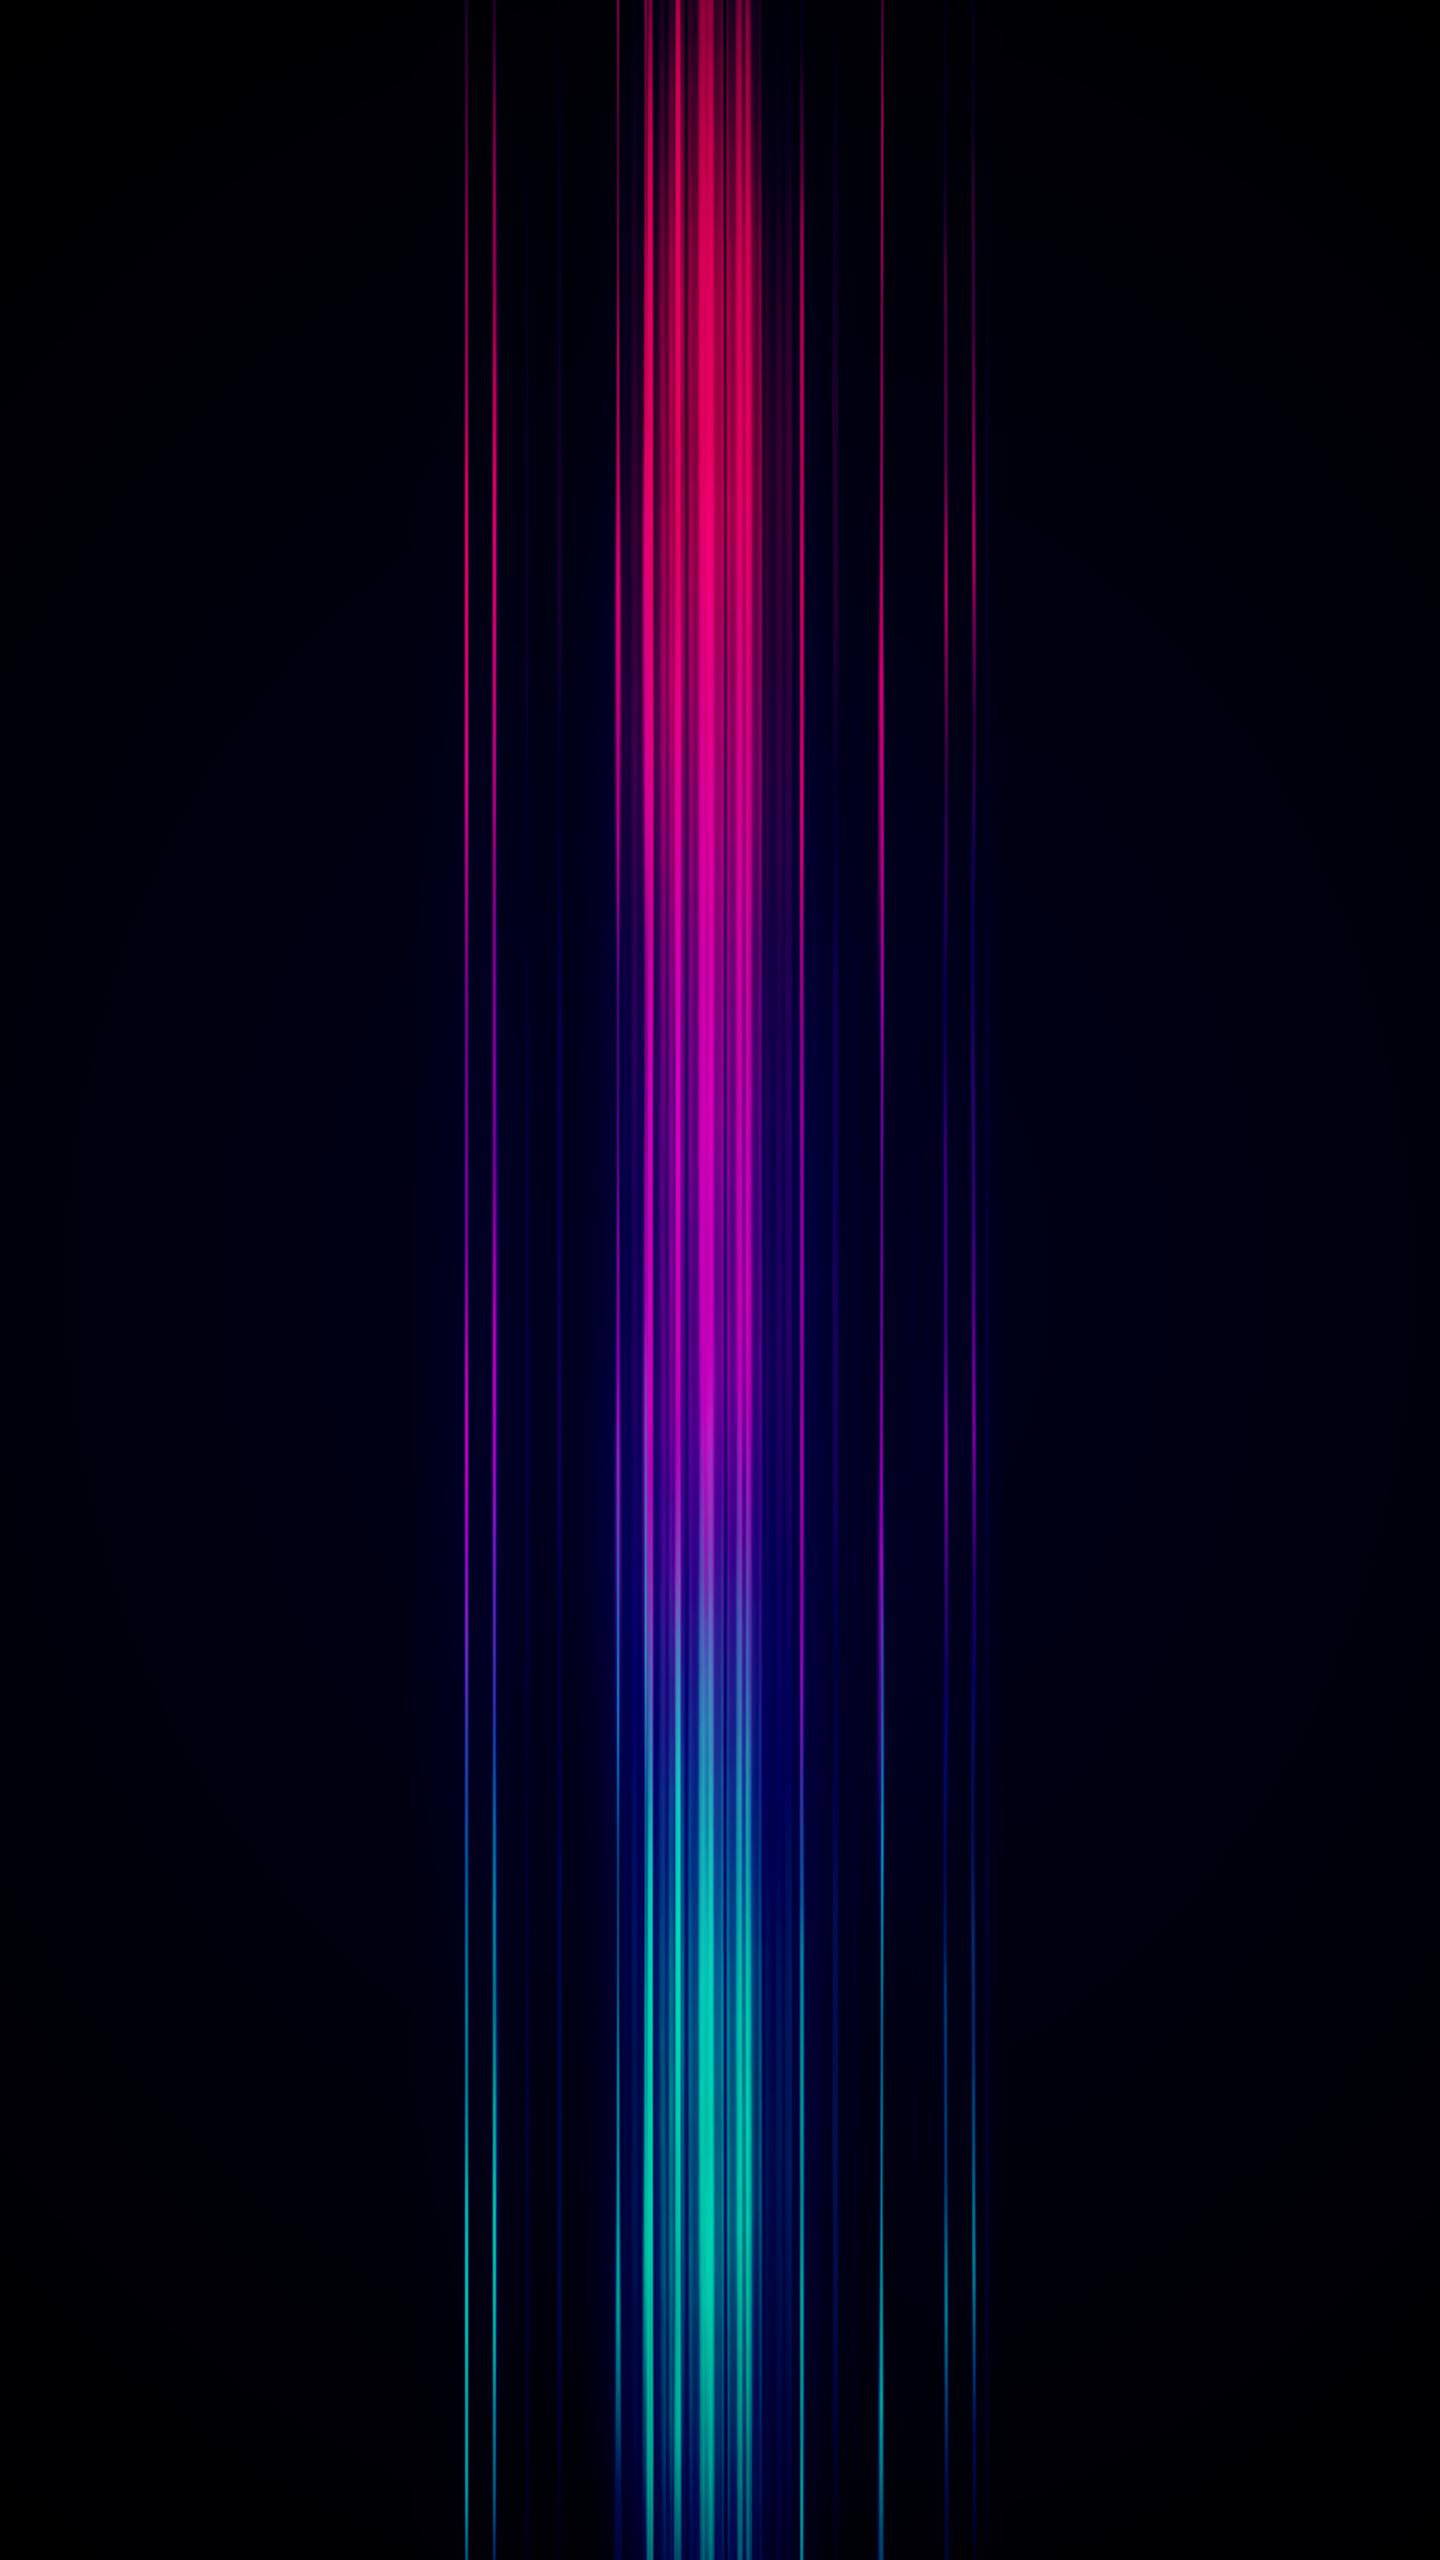 Gradient black background wallpaper in 2020 Phone